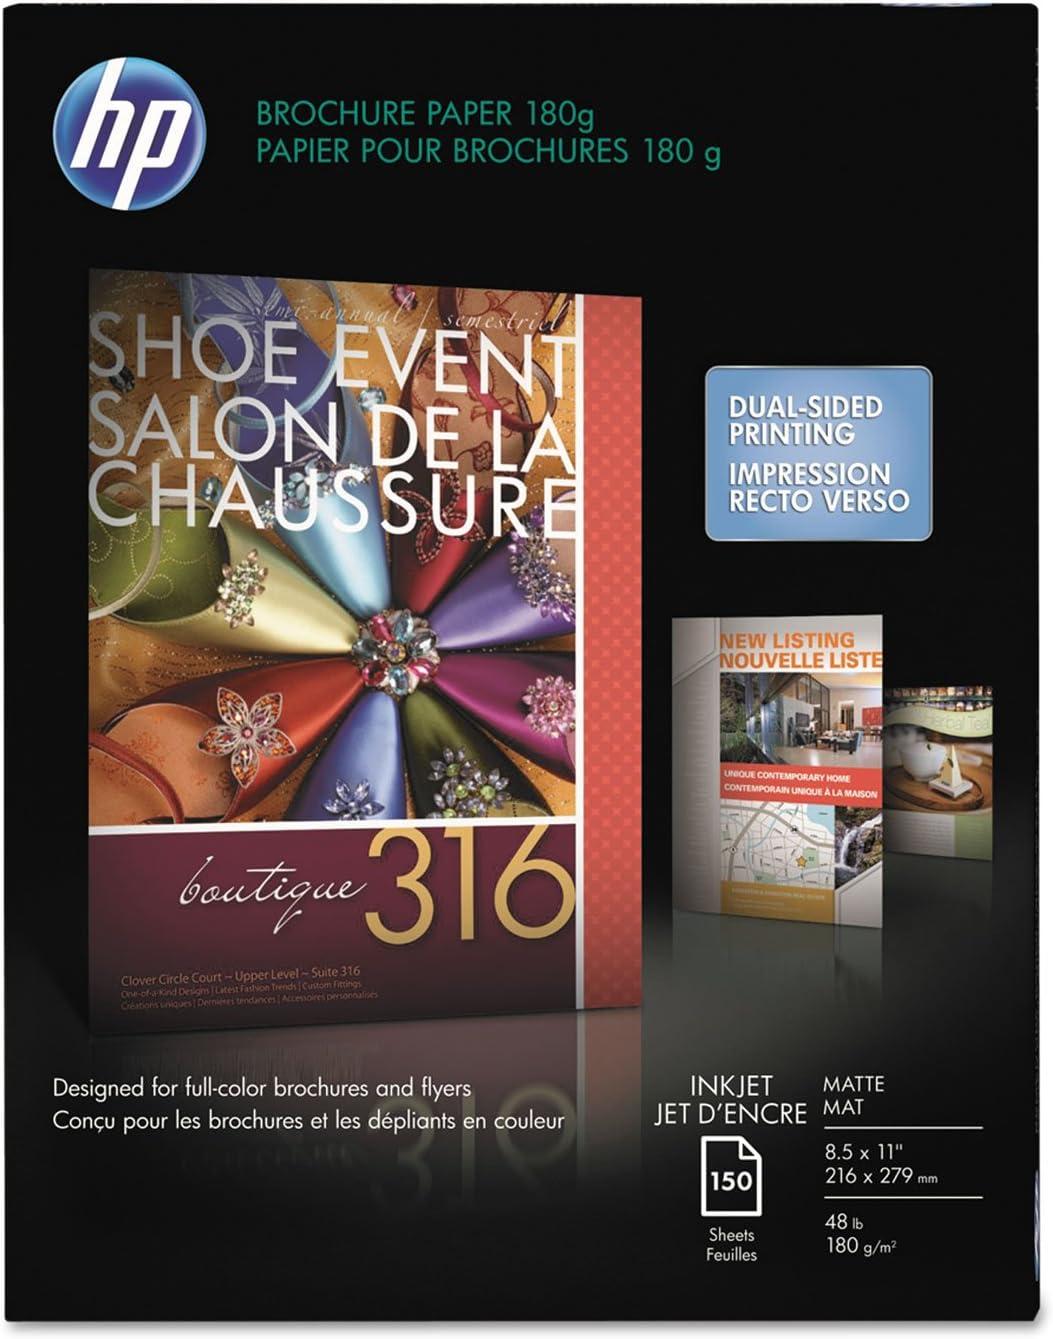 HP CH016A Inkjet Brochure/Flyer Paper, 103 Brightness, 48lb, 8-1/2 x 11, White, 150/Pack